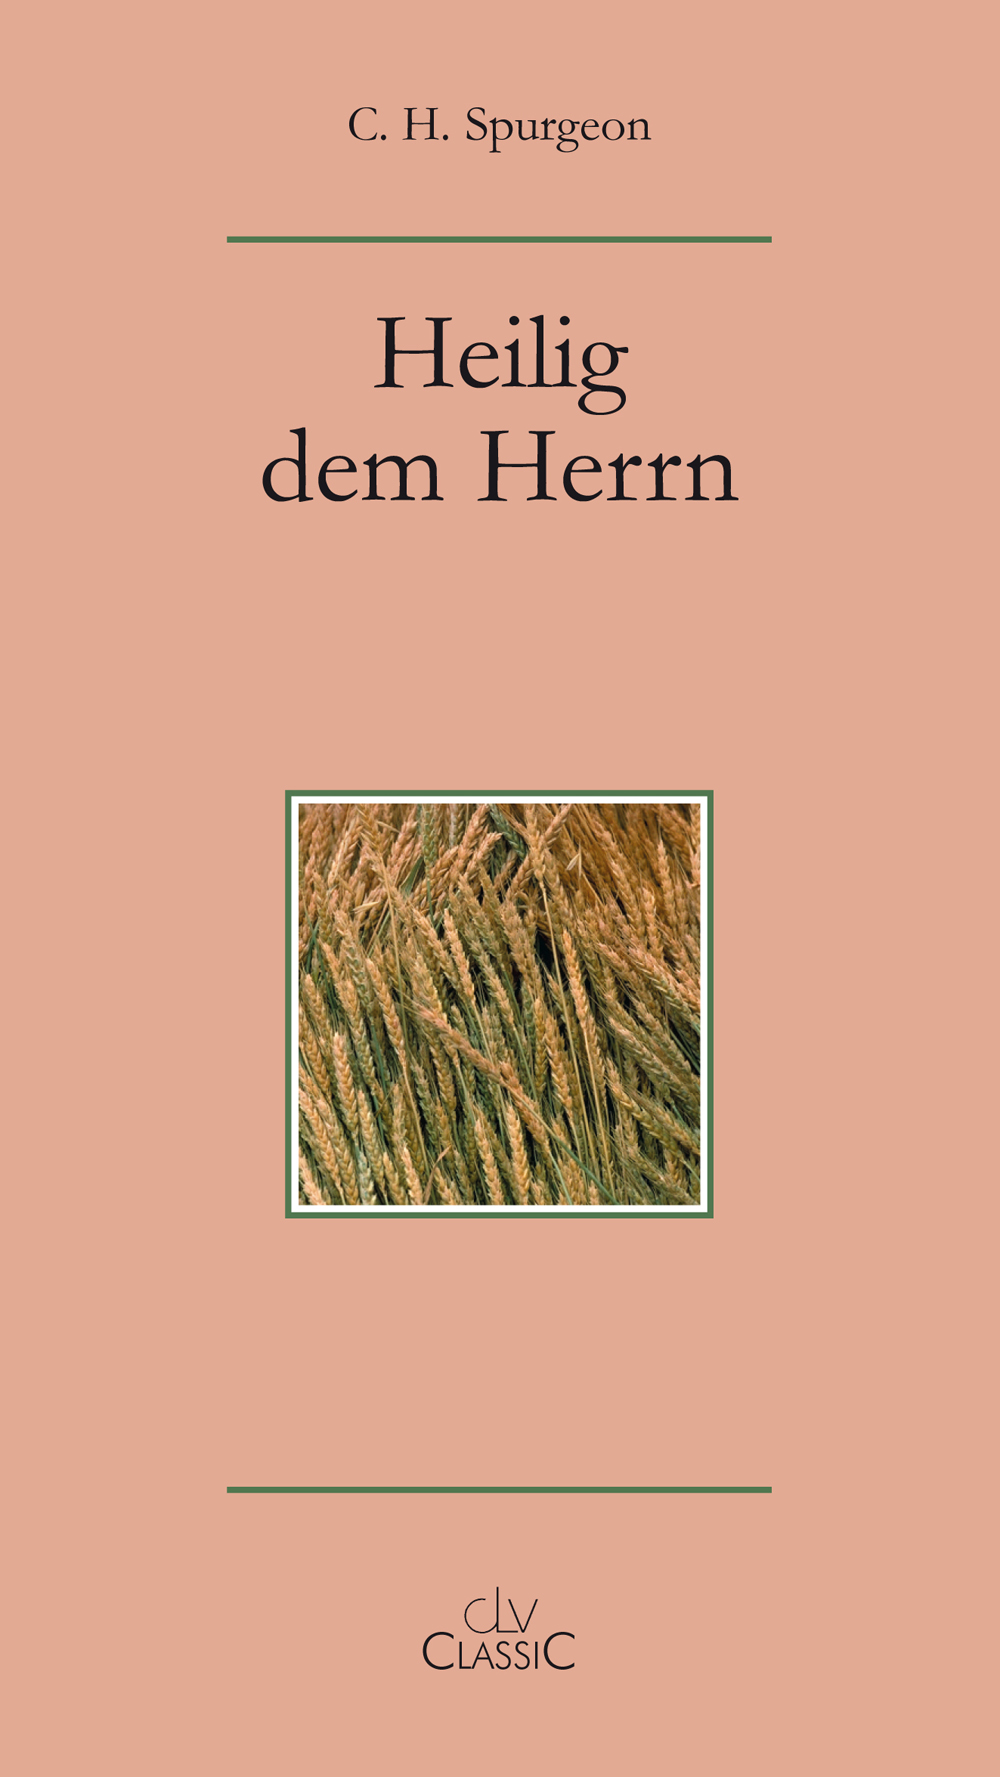 CLV_heilig-dem-herrn_charles-h-spurgeon_255387_1